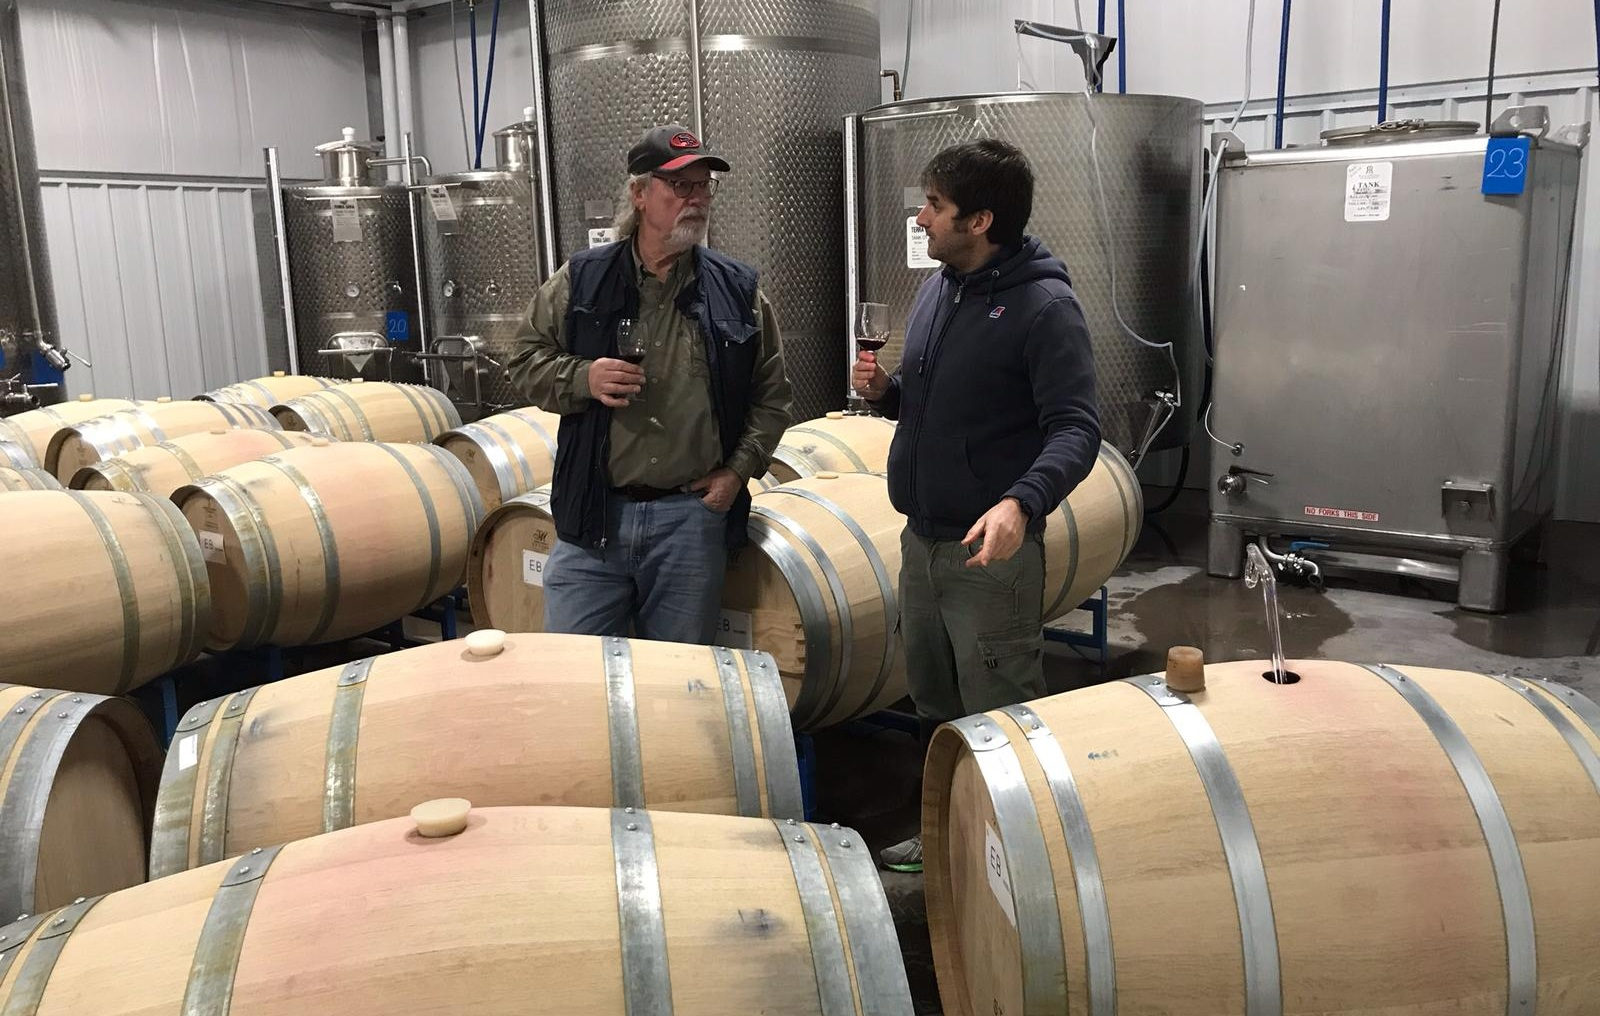 Winery scene